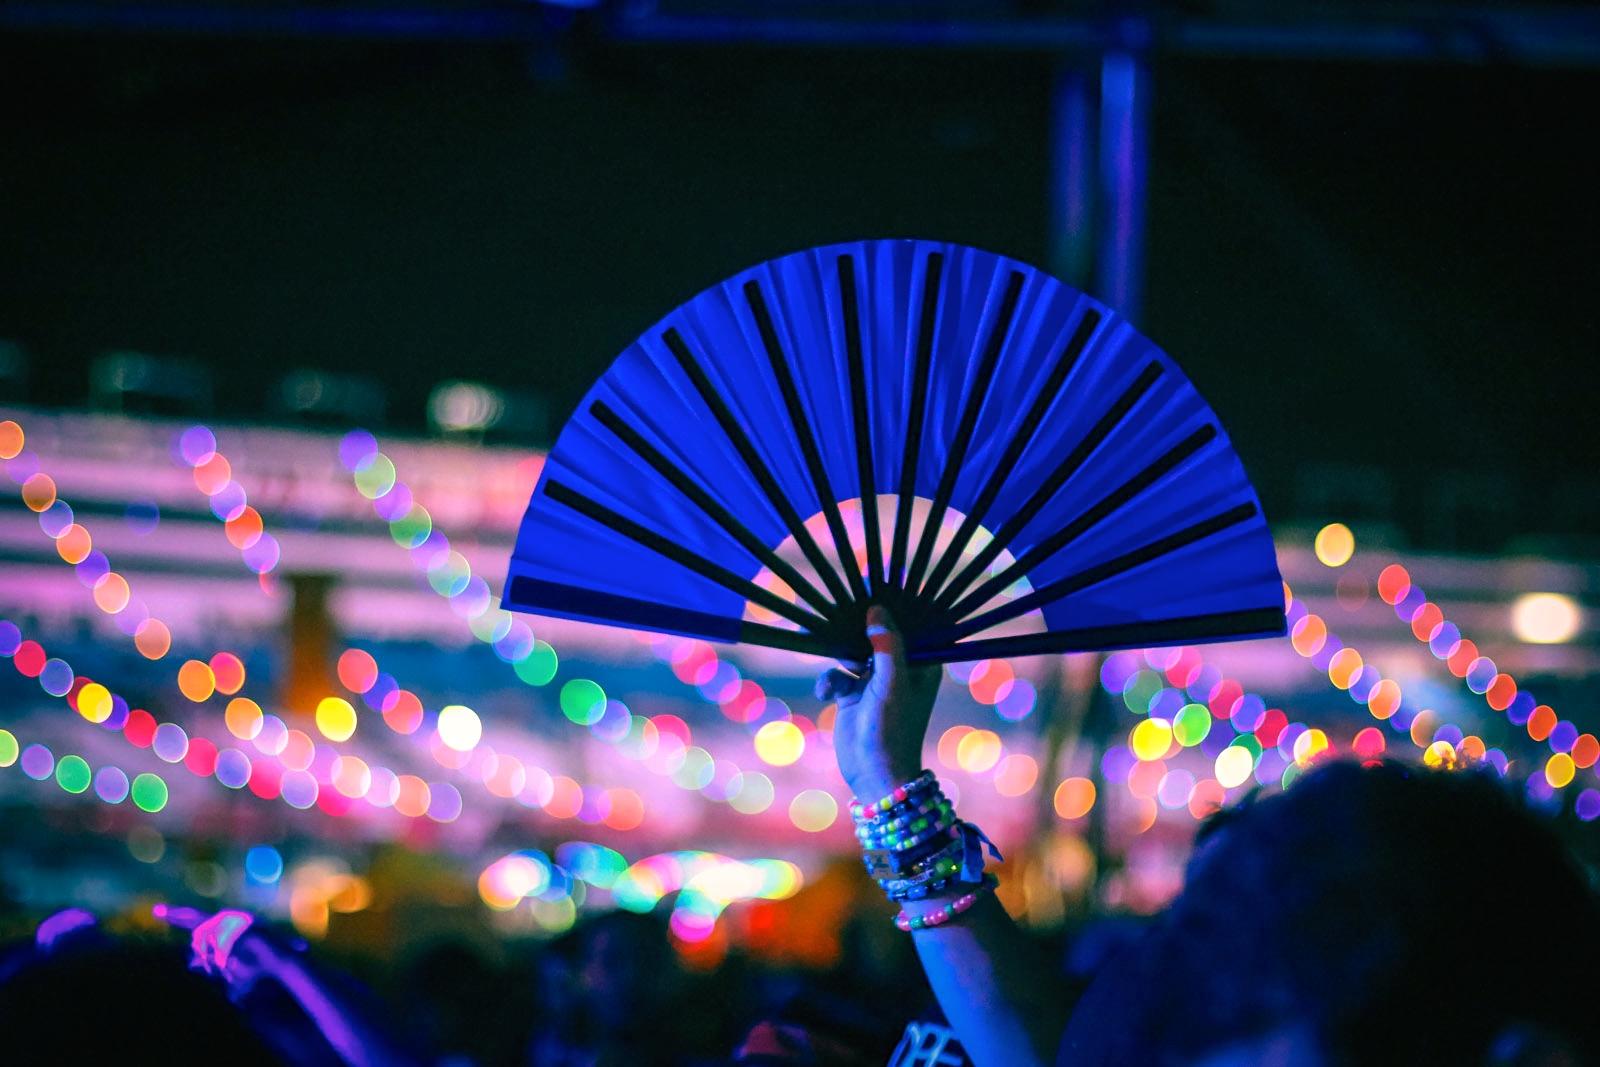 Electric Daisy Carnival 2014 Art Gimbel Totems 14